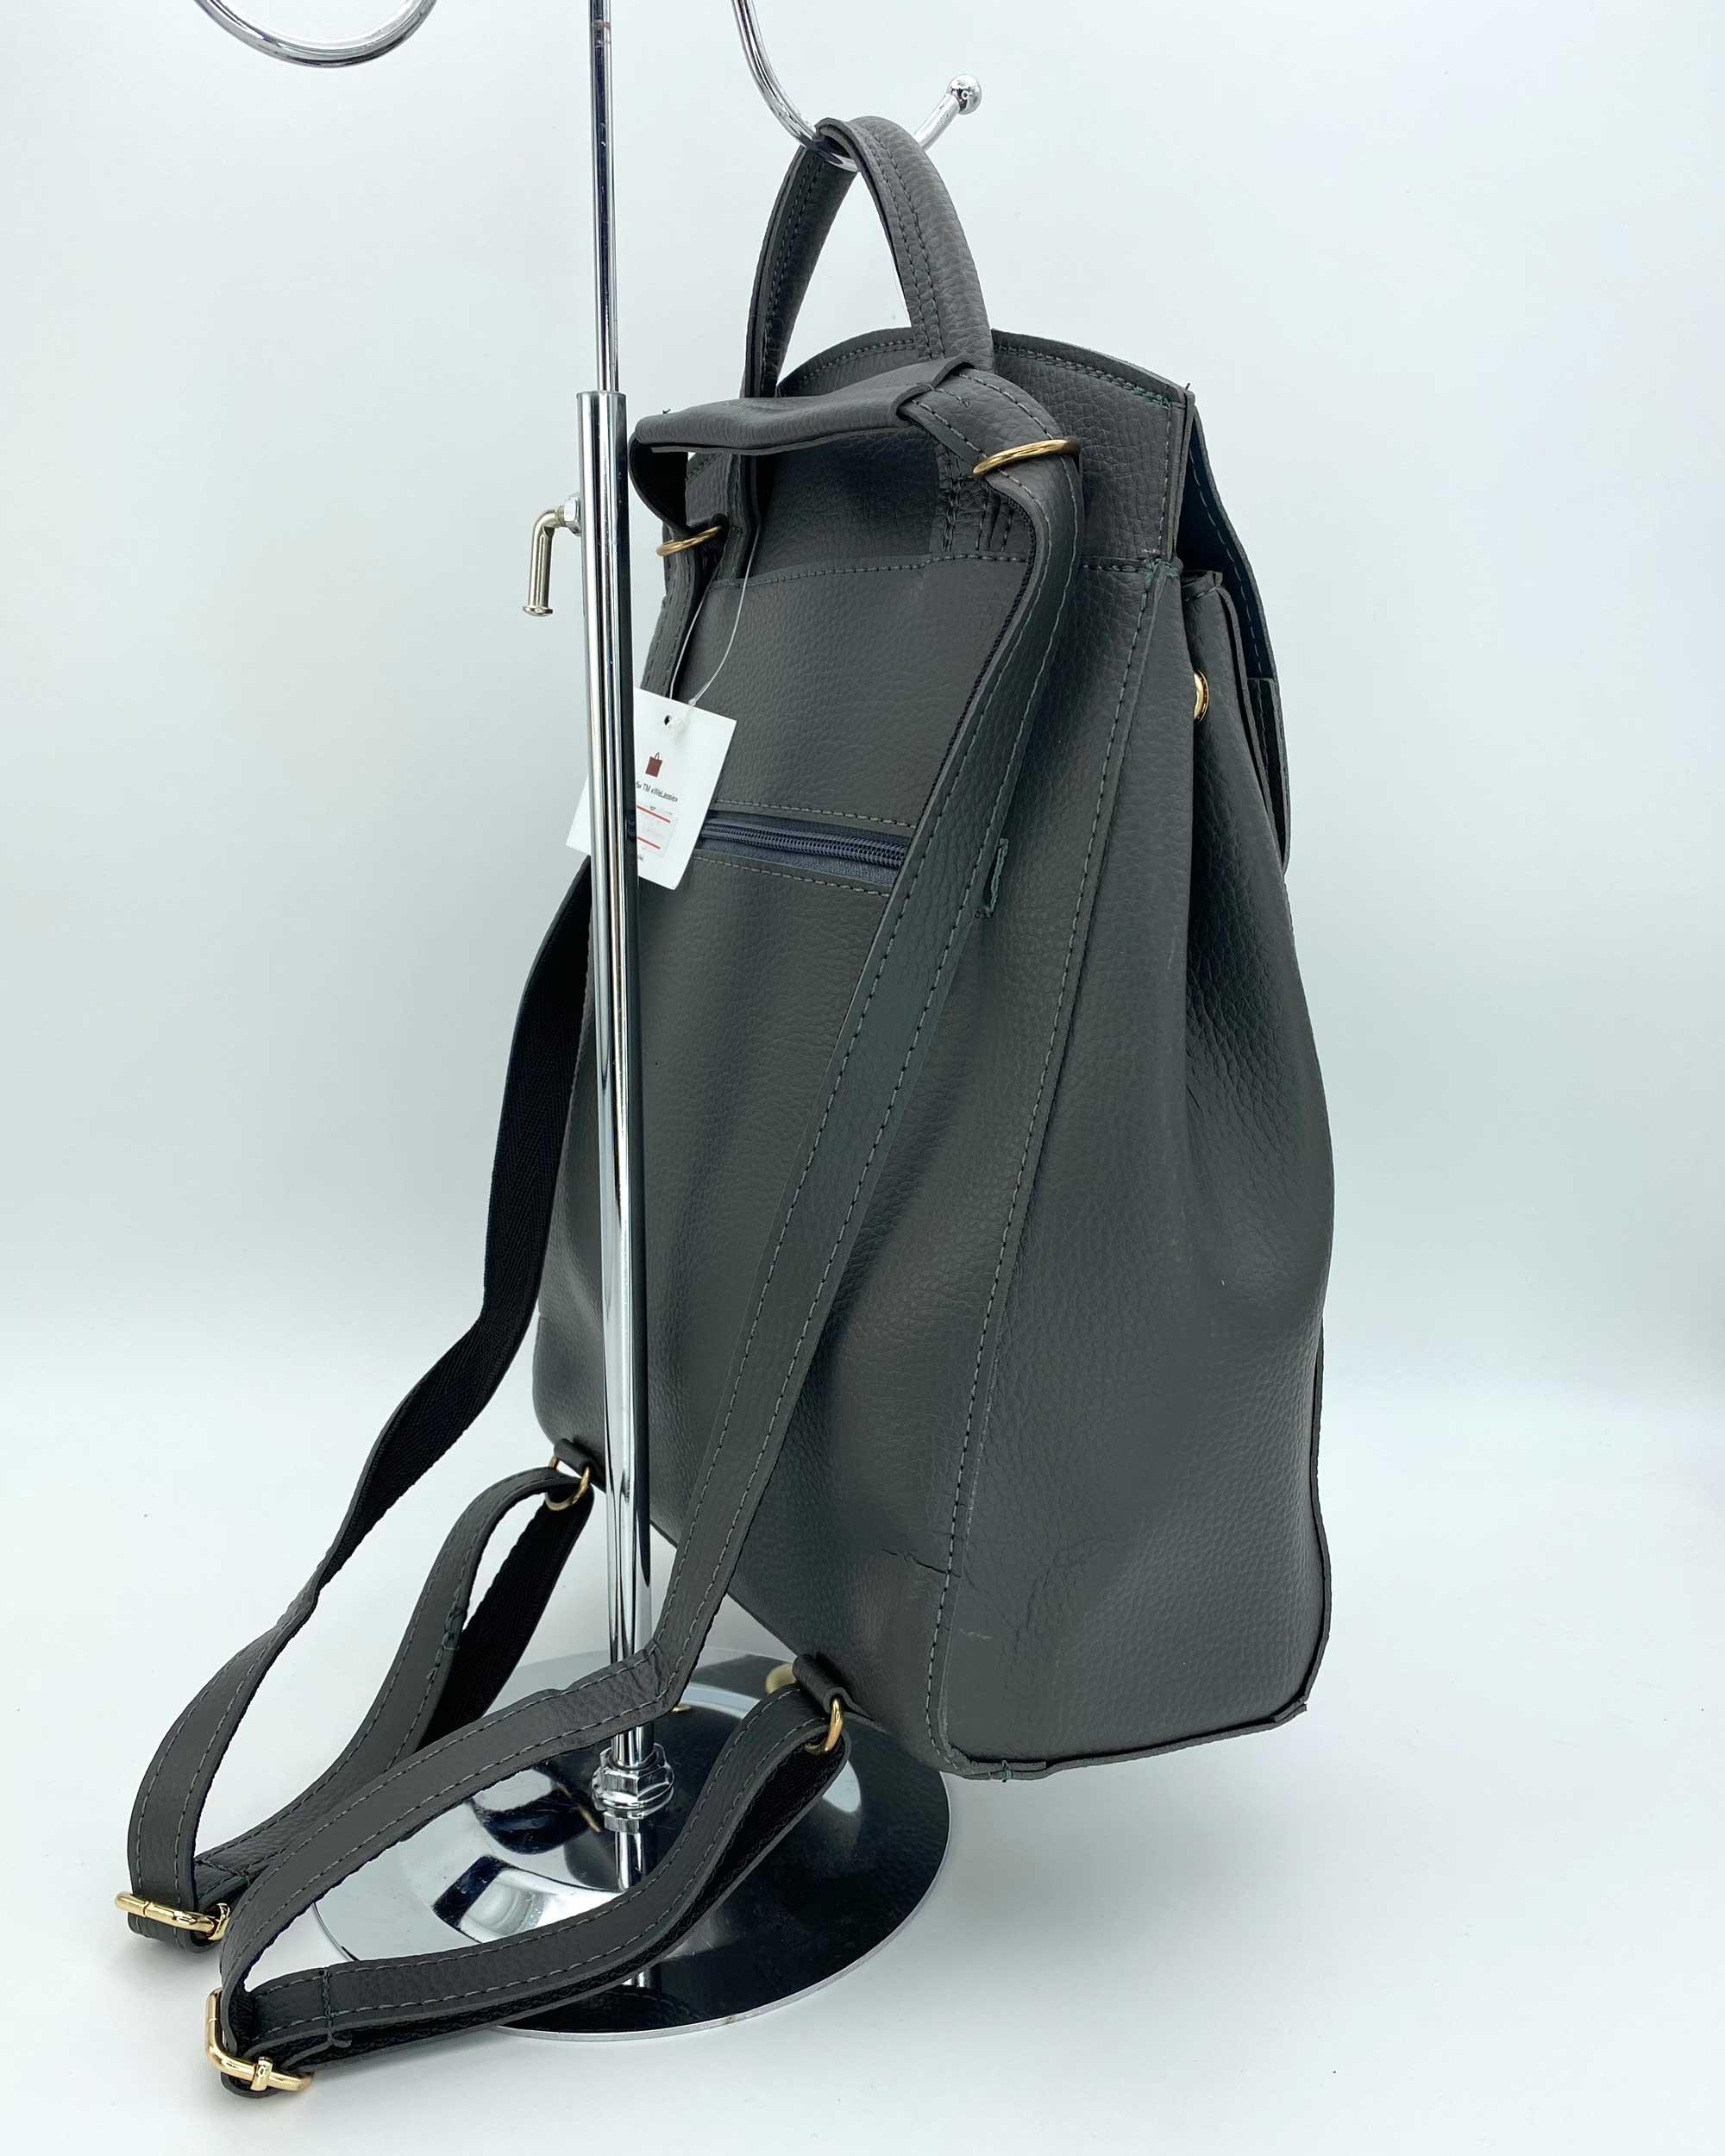 4e301e3c8a66 Молодежный сумка-рюкзак Сердце серого цвета оптом арт.44601 | WeLassie